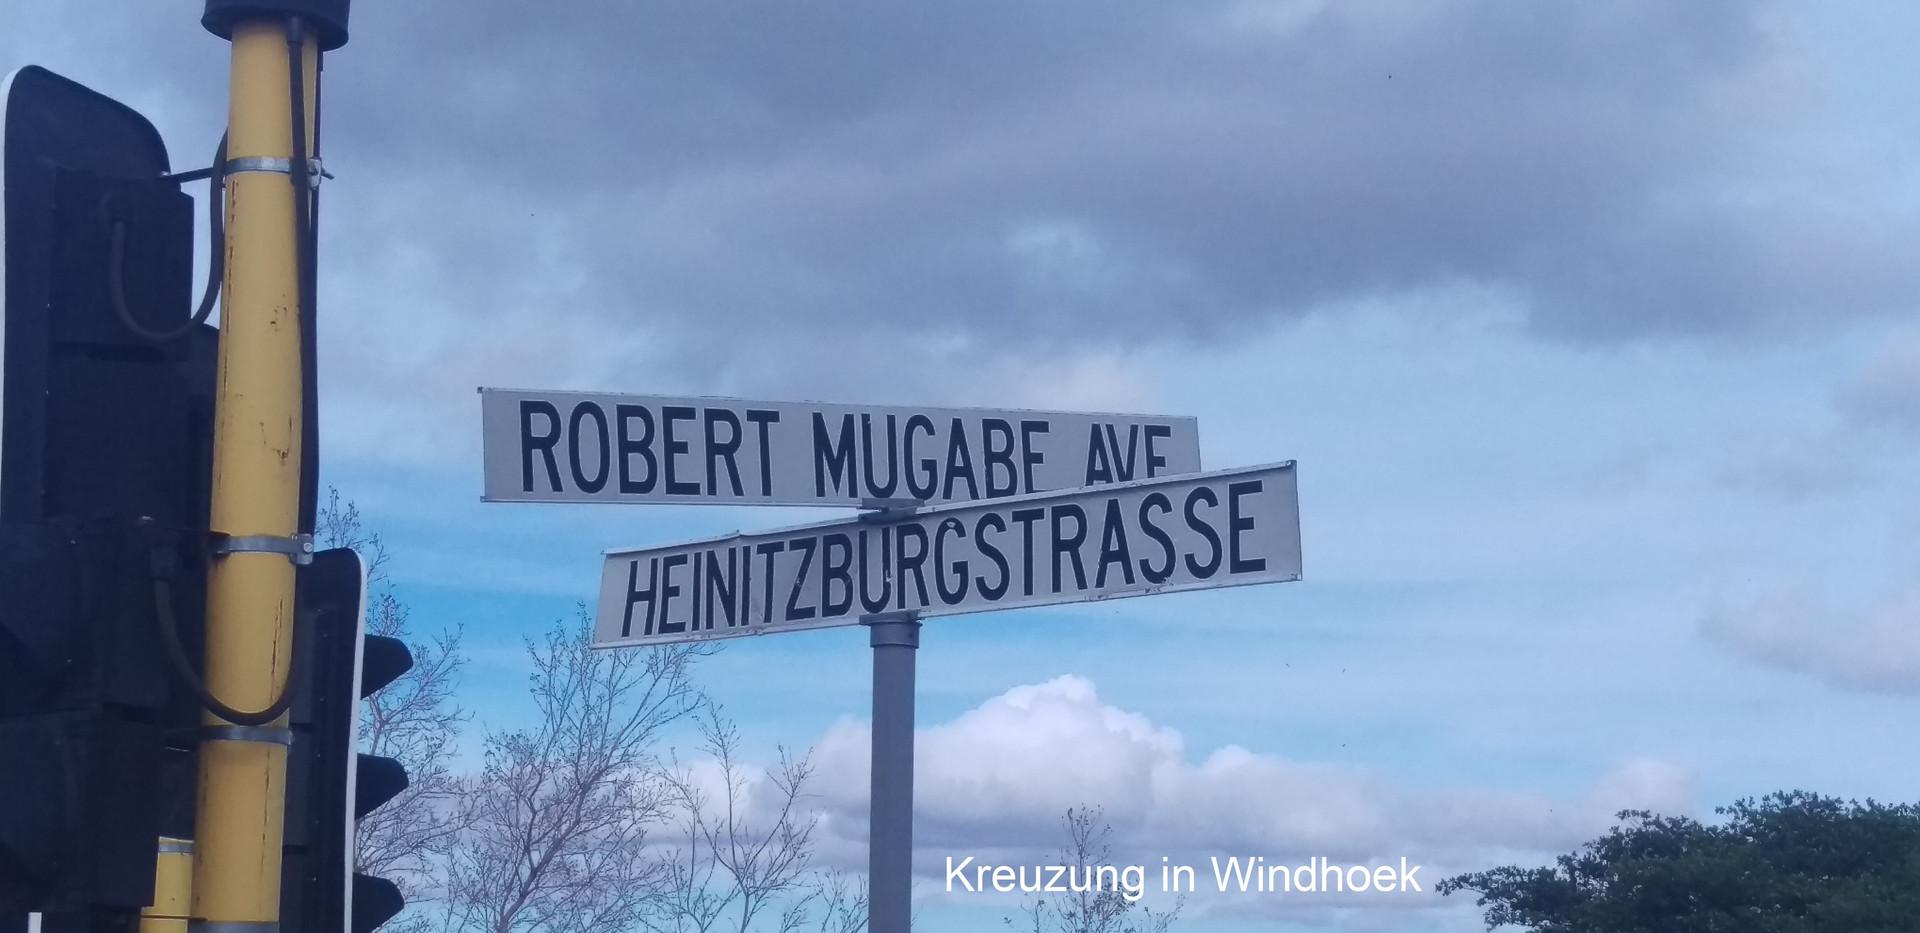 Kreuzung Windhoek_beschriftet.jpg